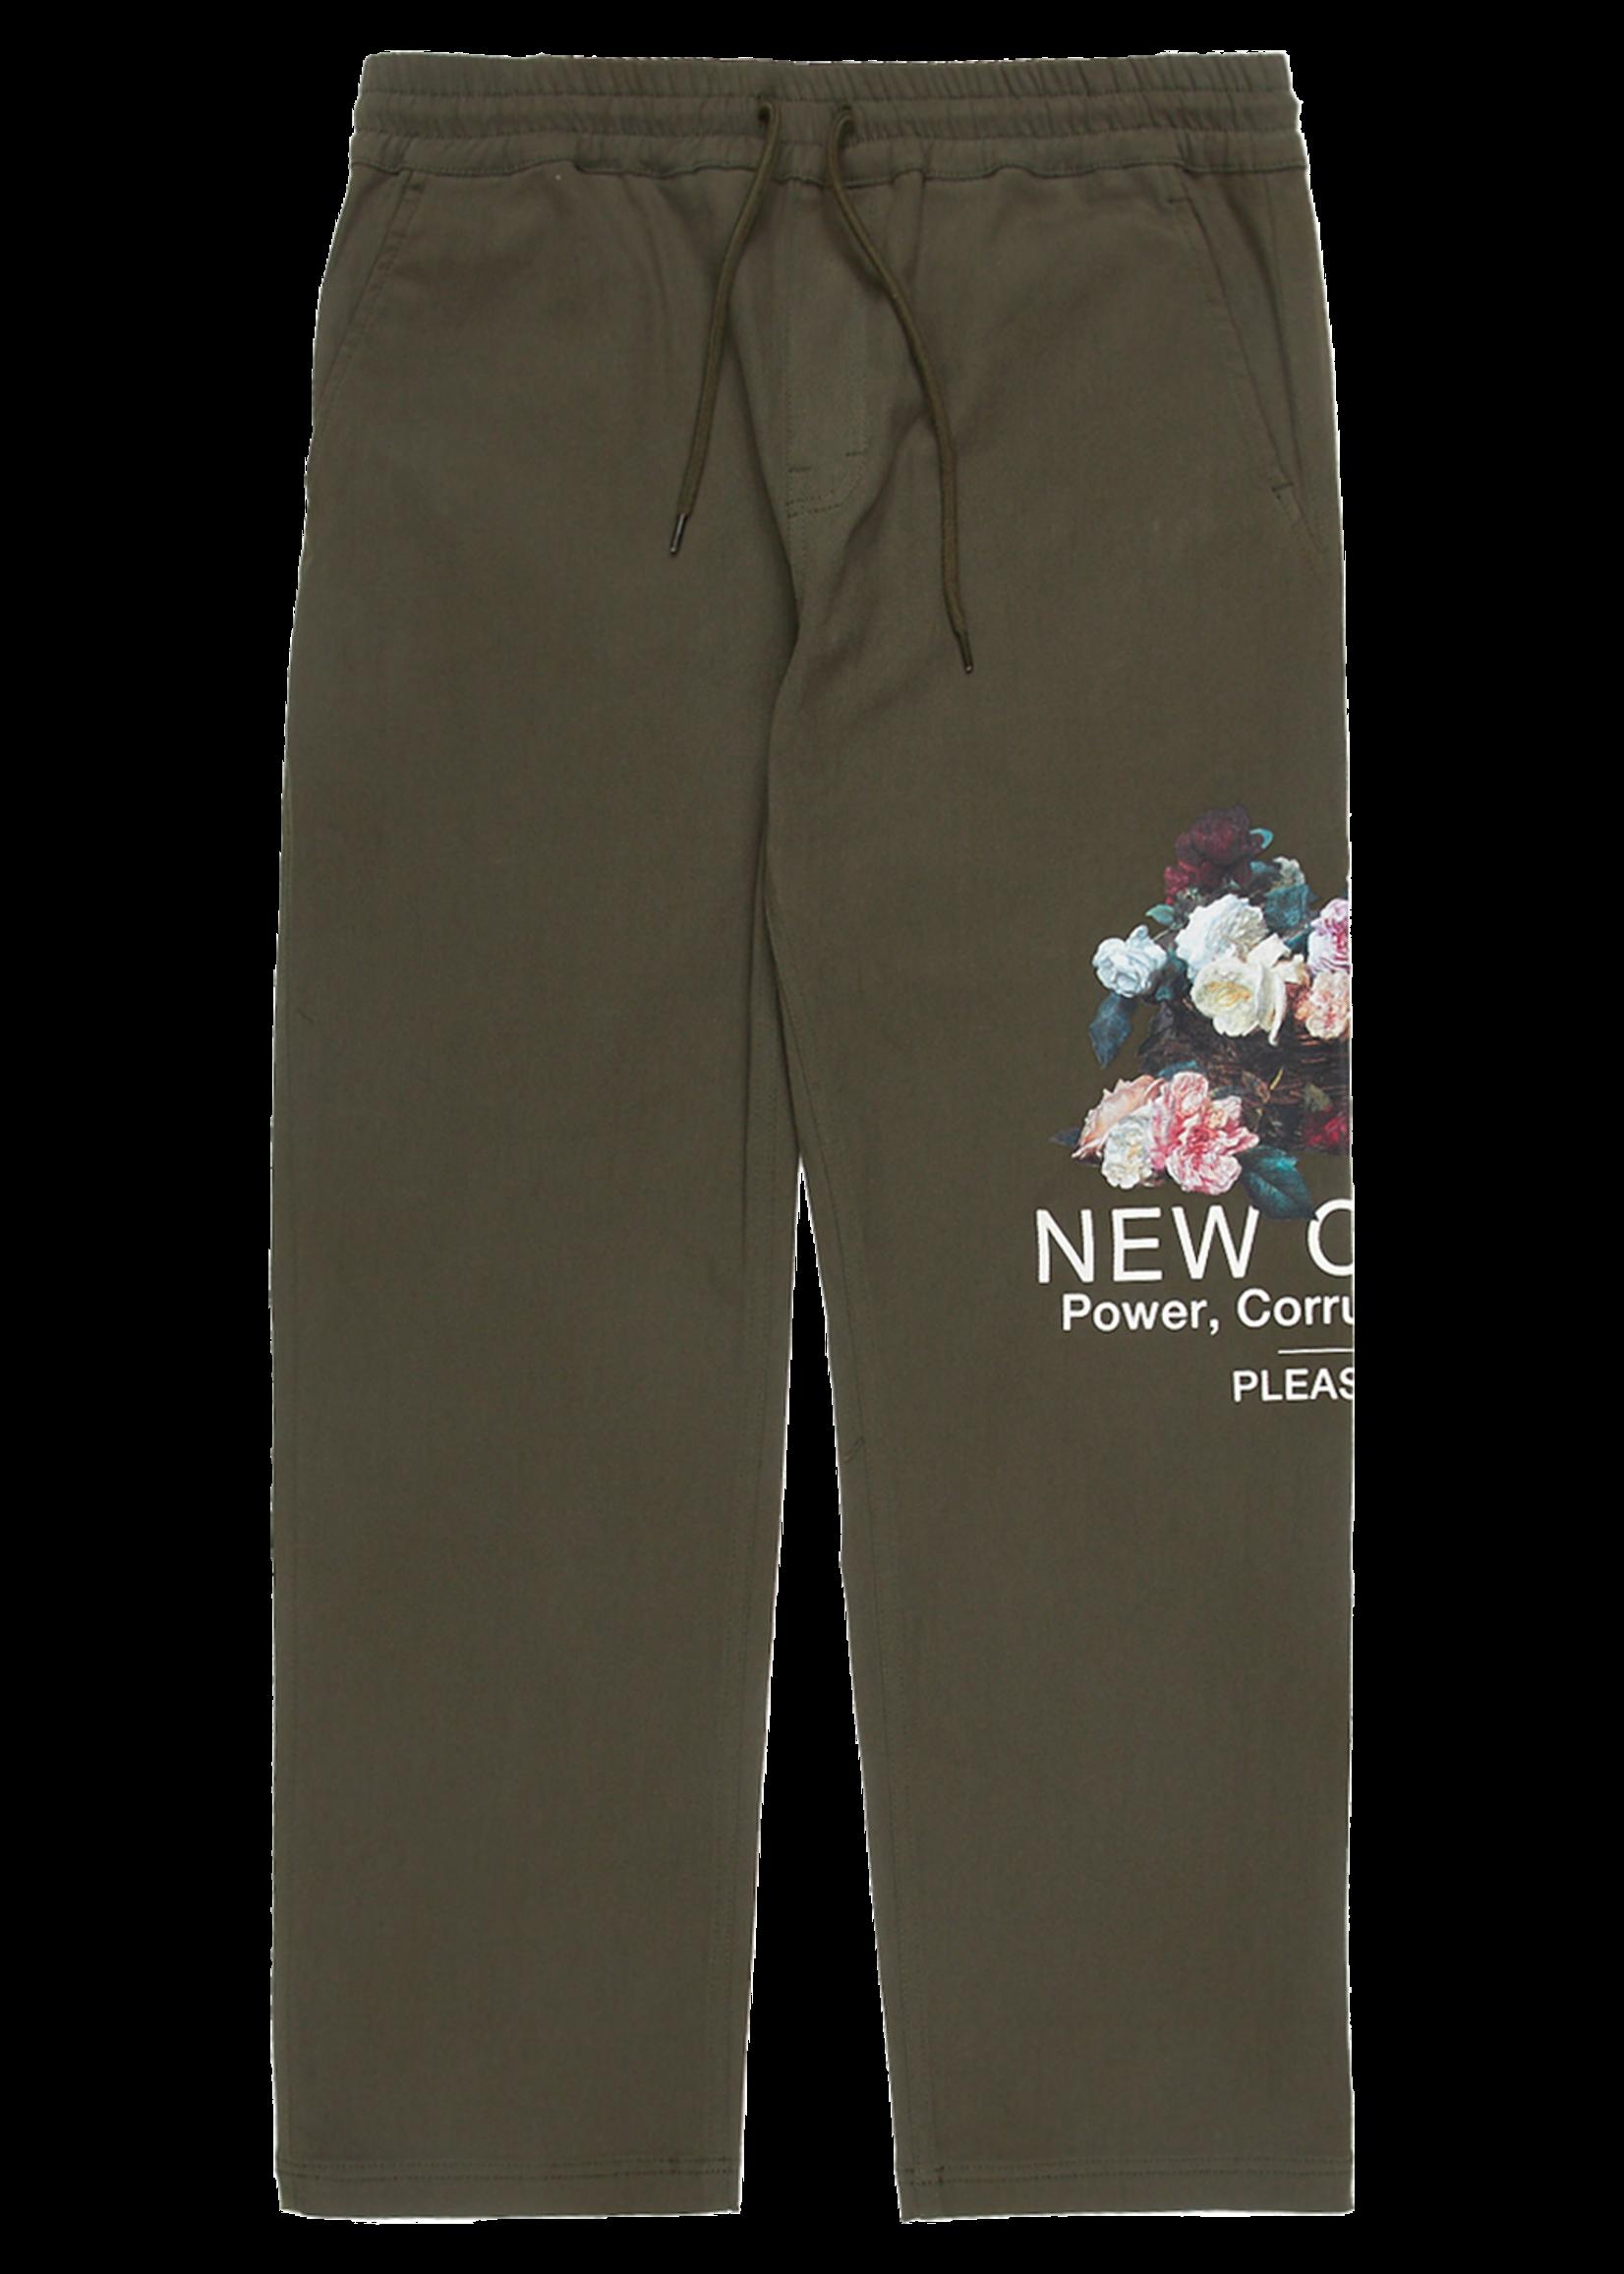 PLEASURES New Order Power Pants in Olive